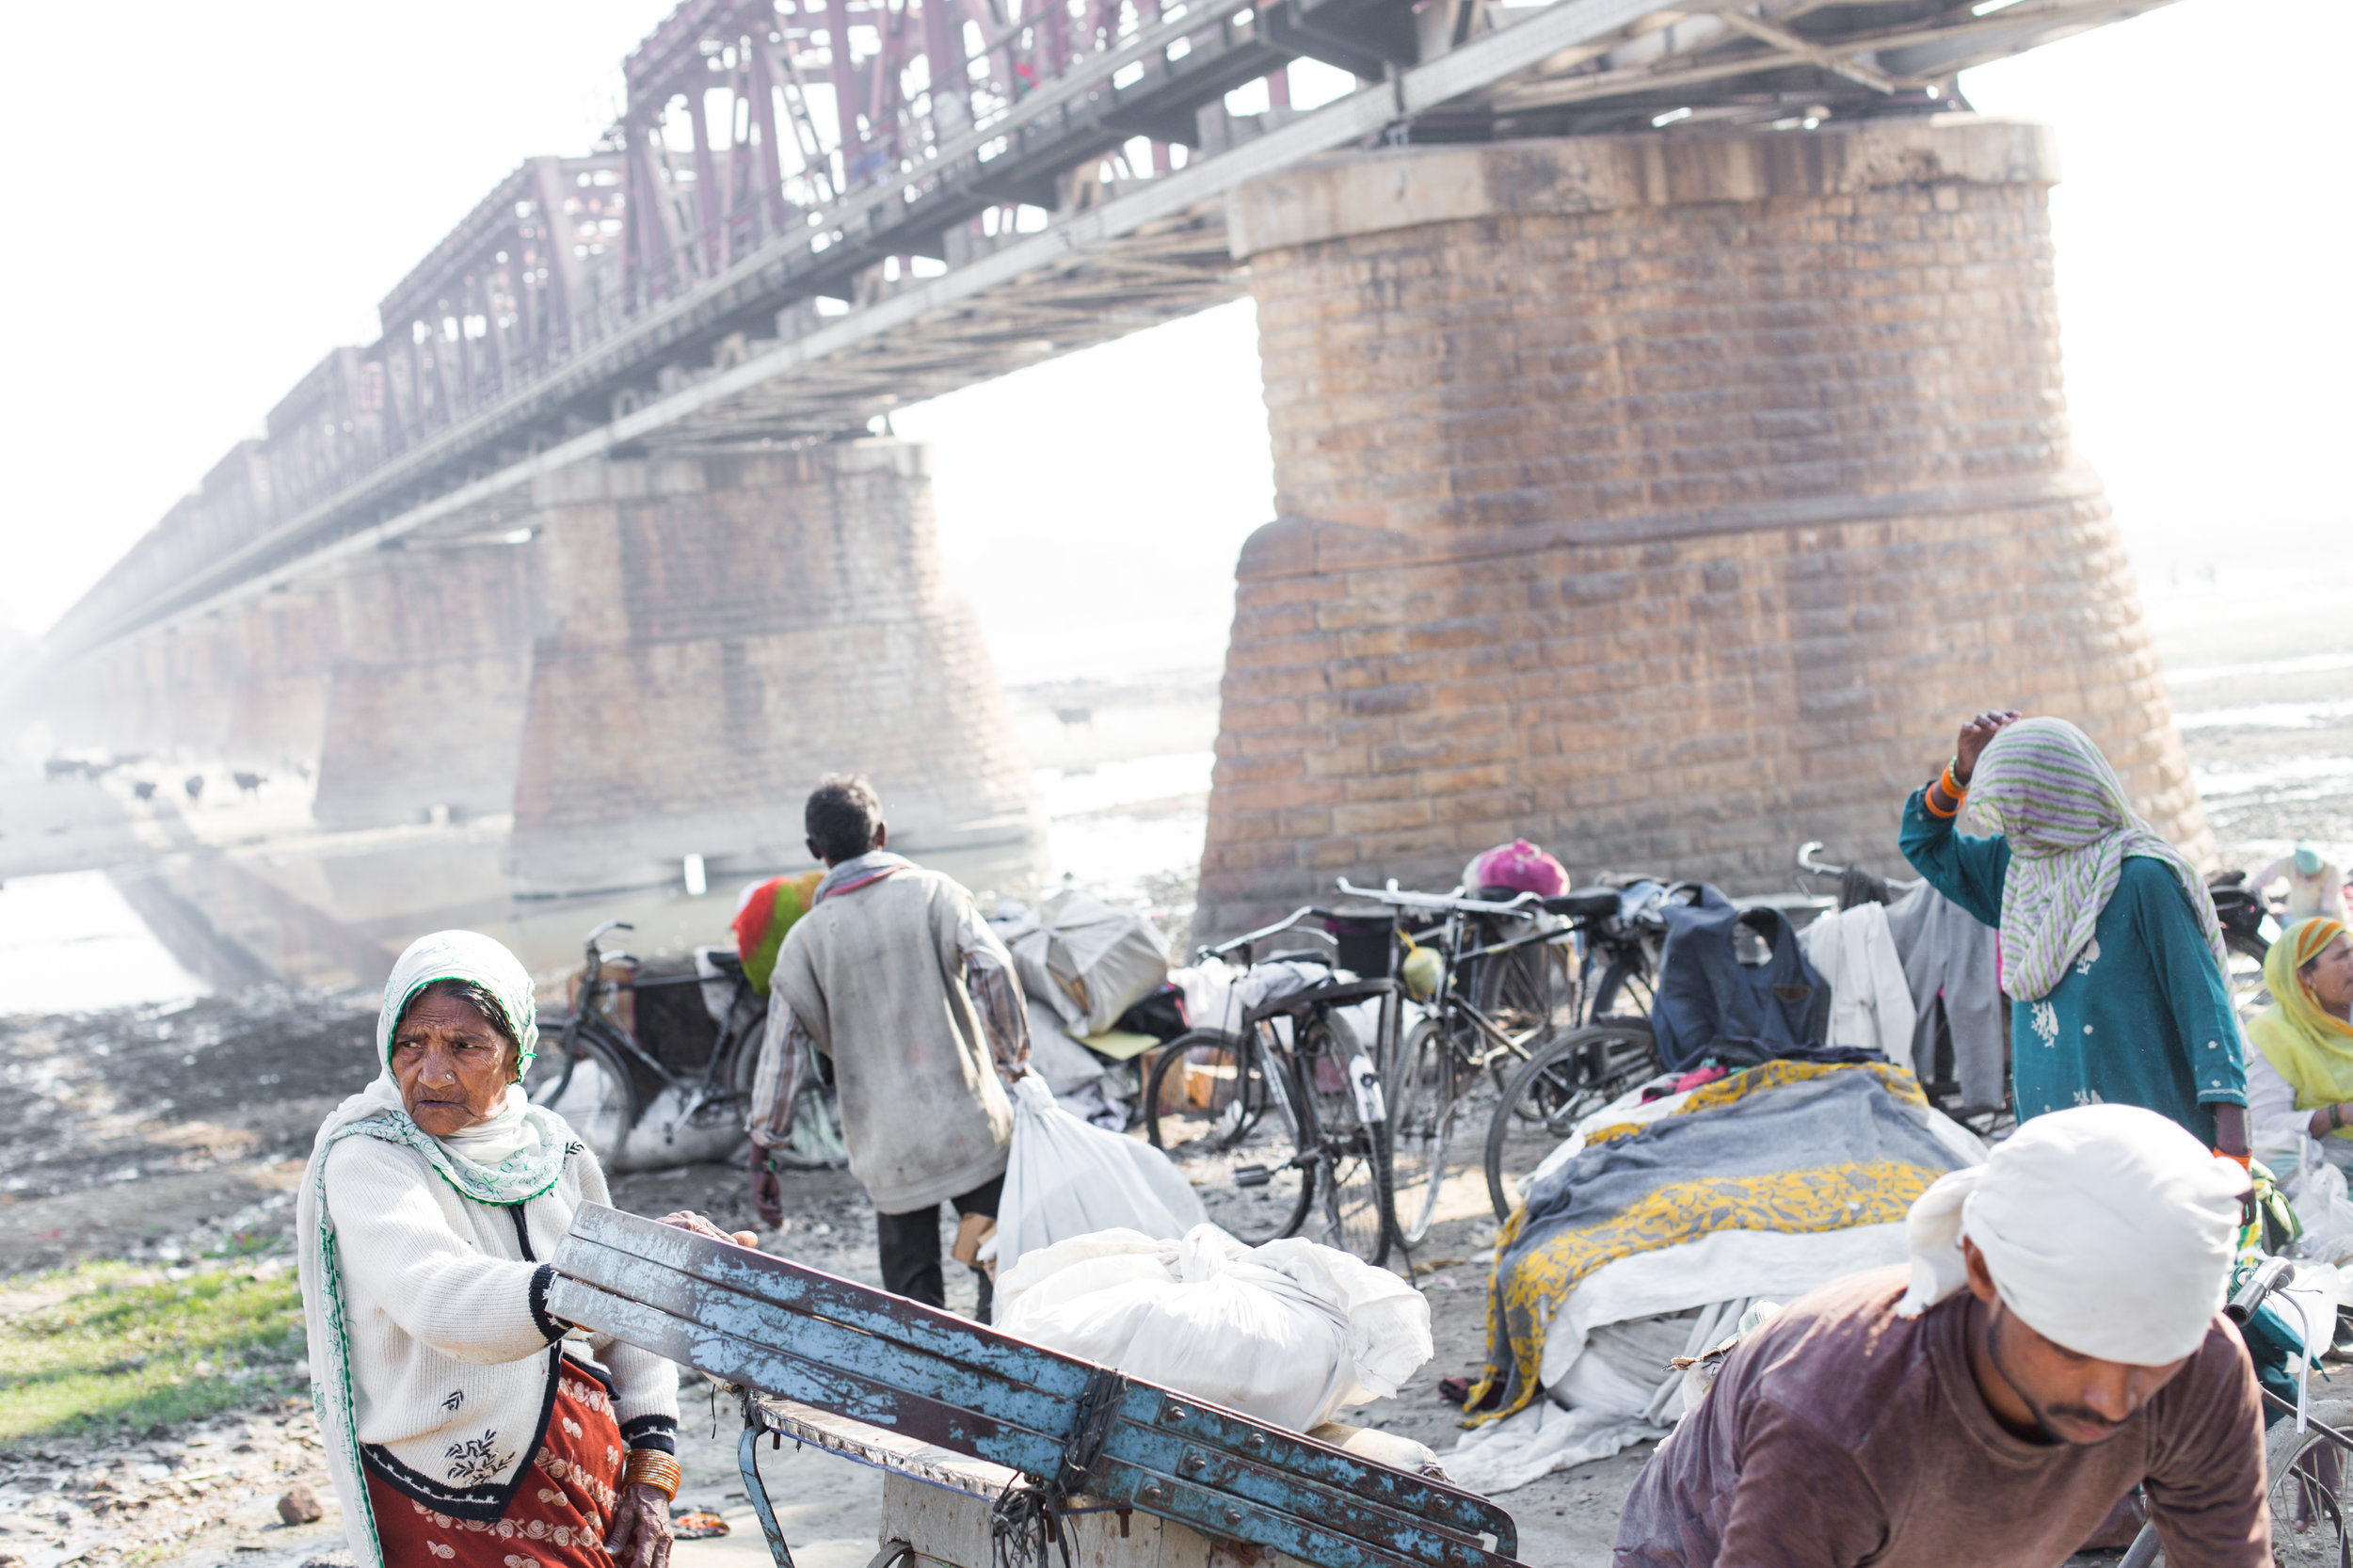 Yamuna River, India